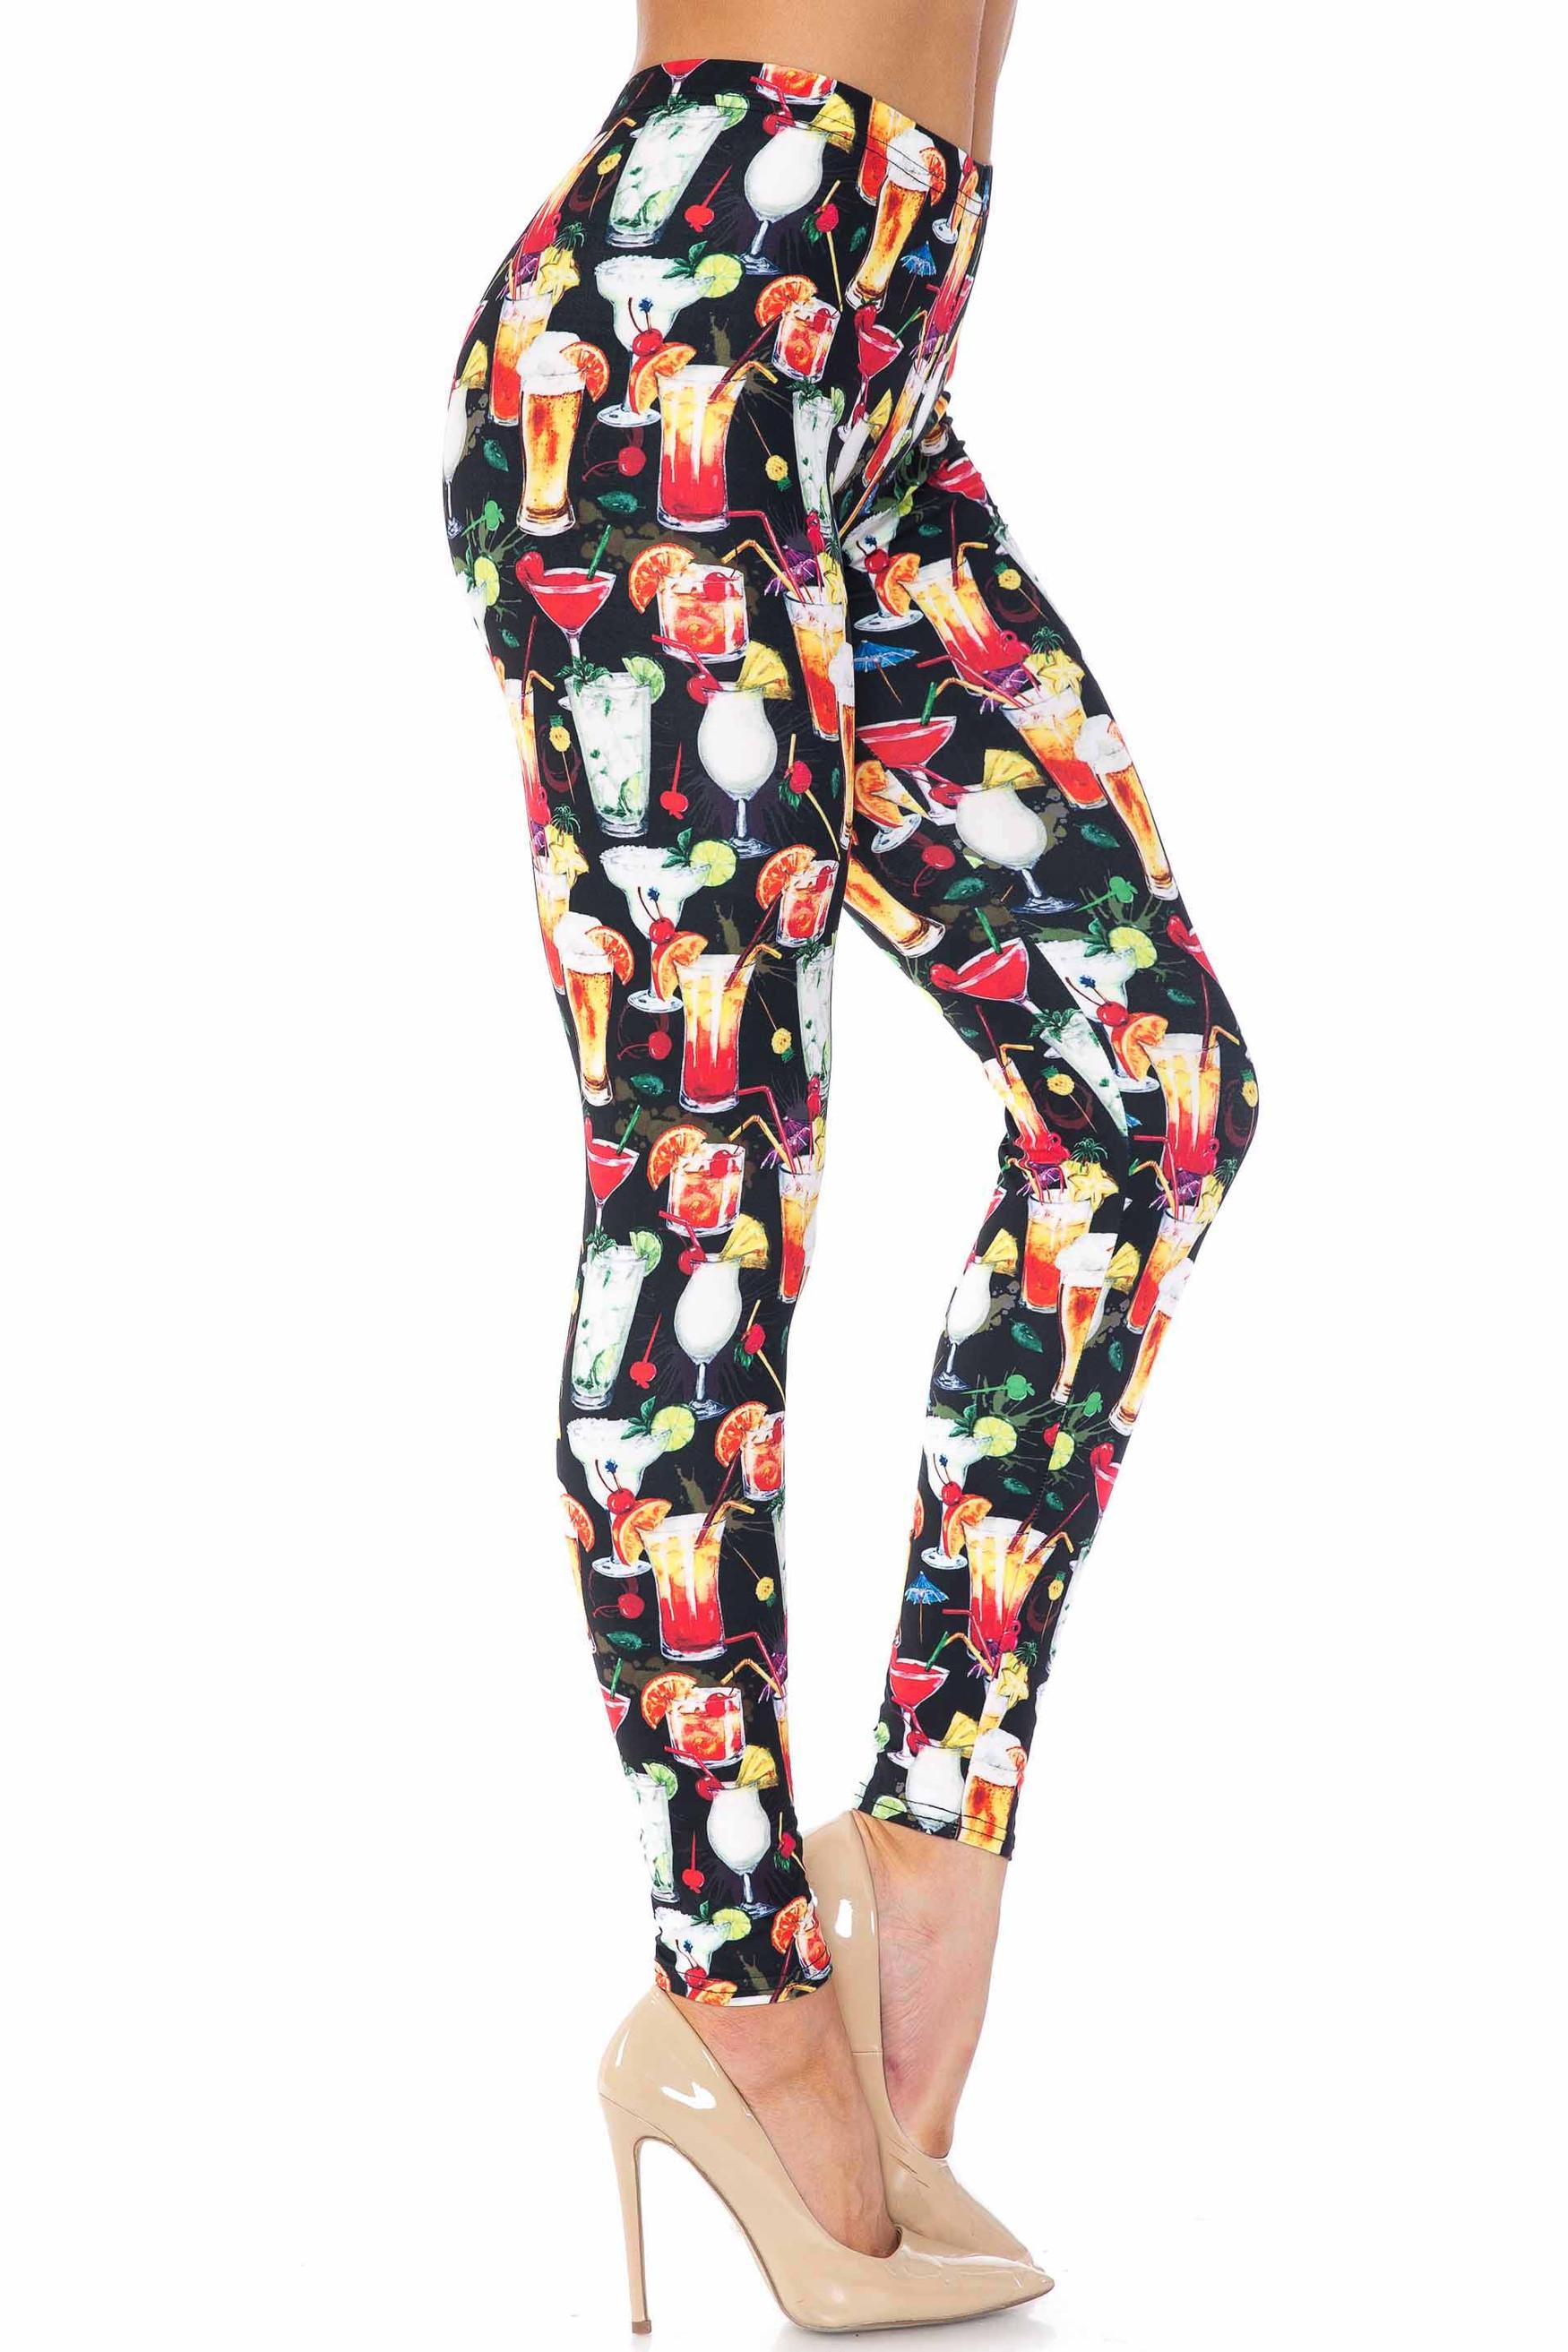 Creamy Soft Tropical Cocktails Extra Plus Size Leggings - 3X-5X - USA Fashion™